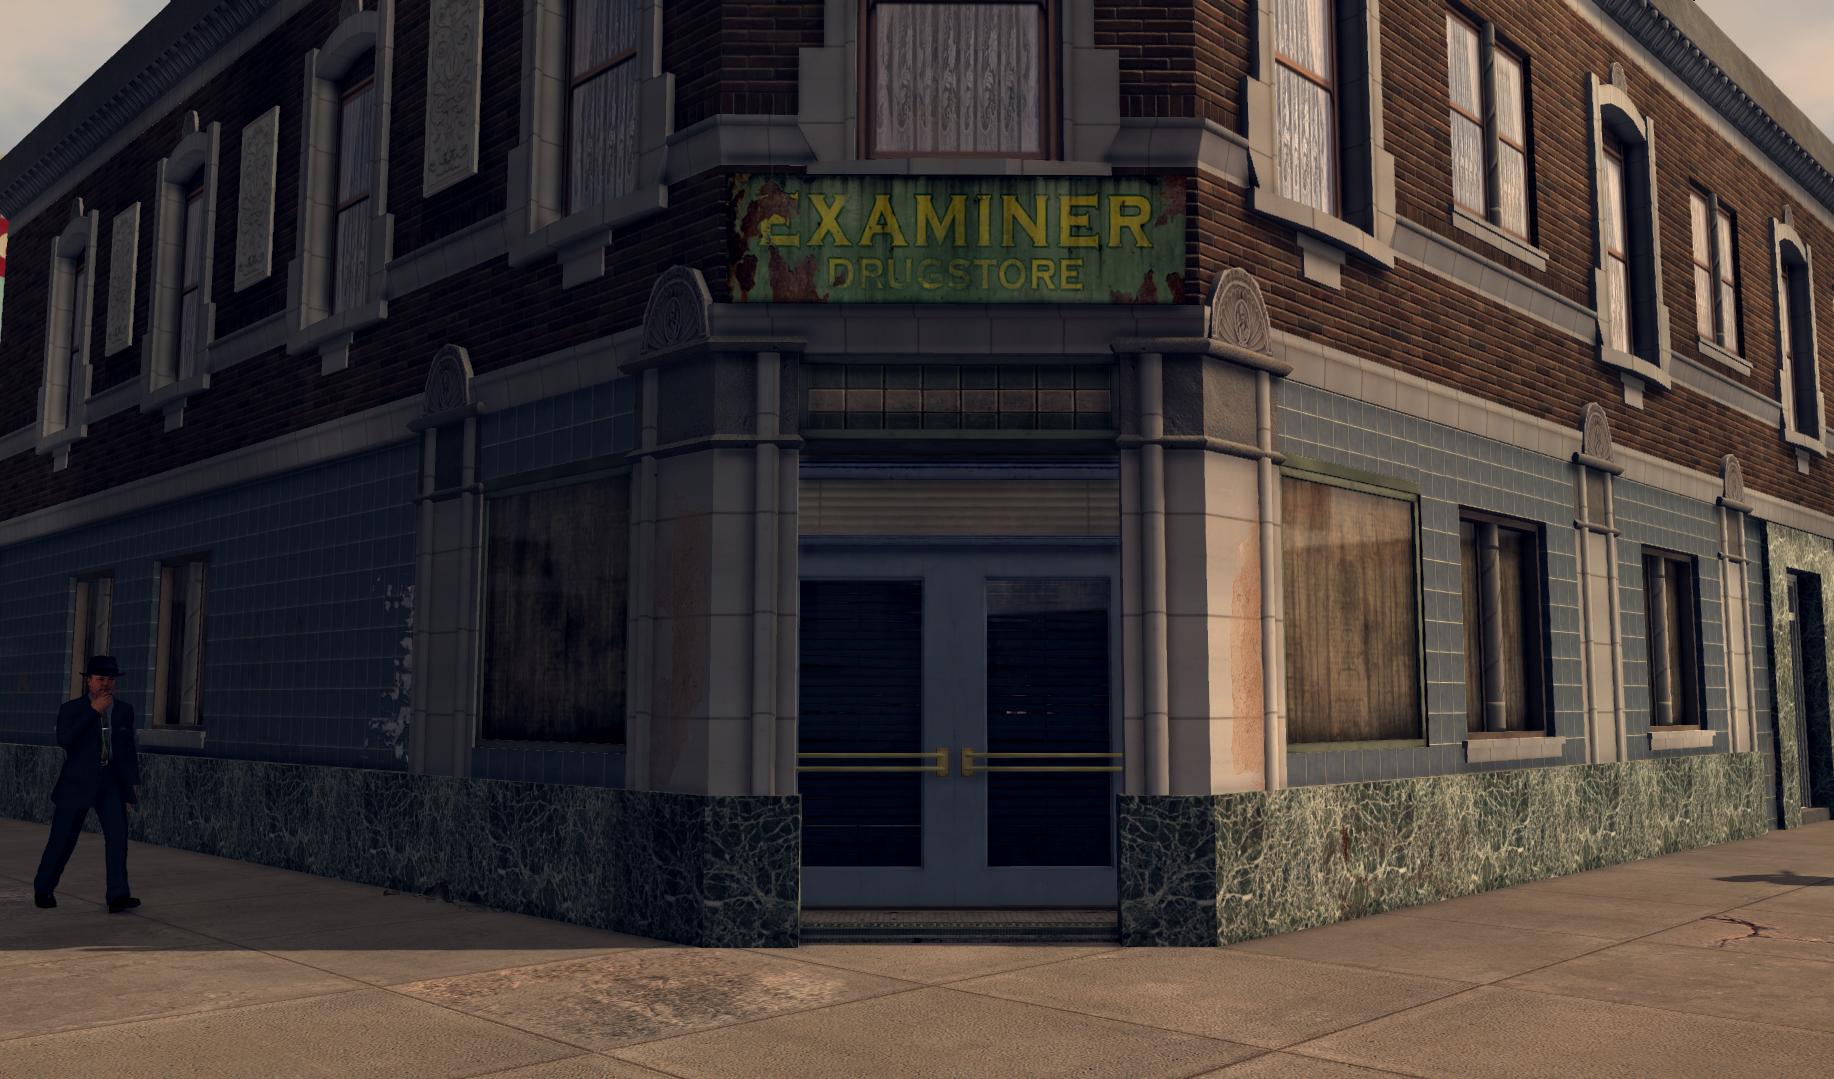 Examiner Drugstore